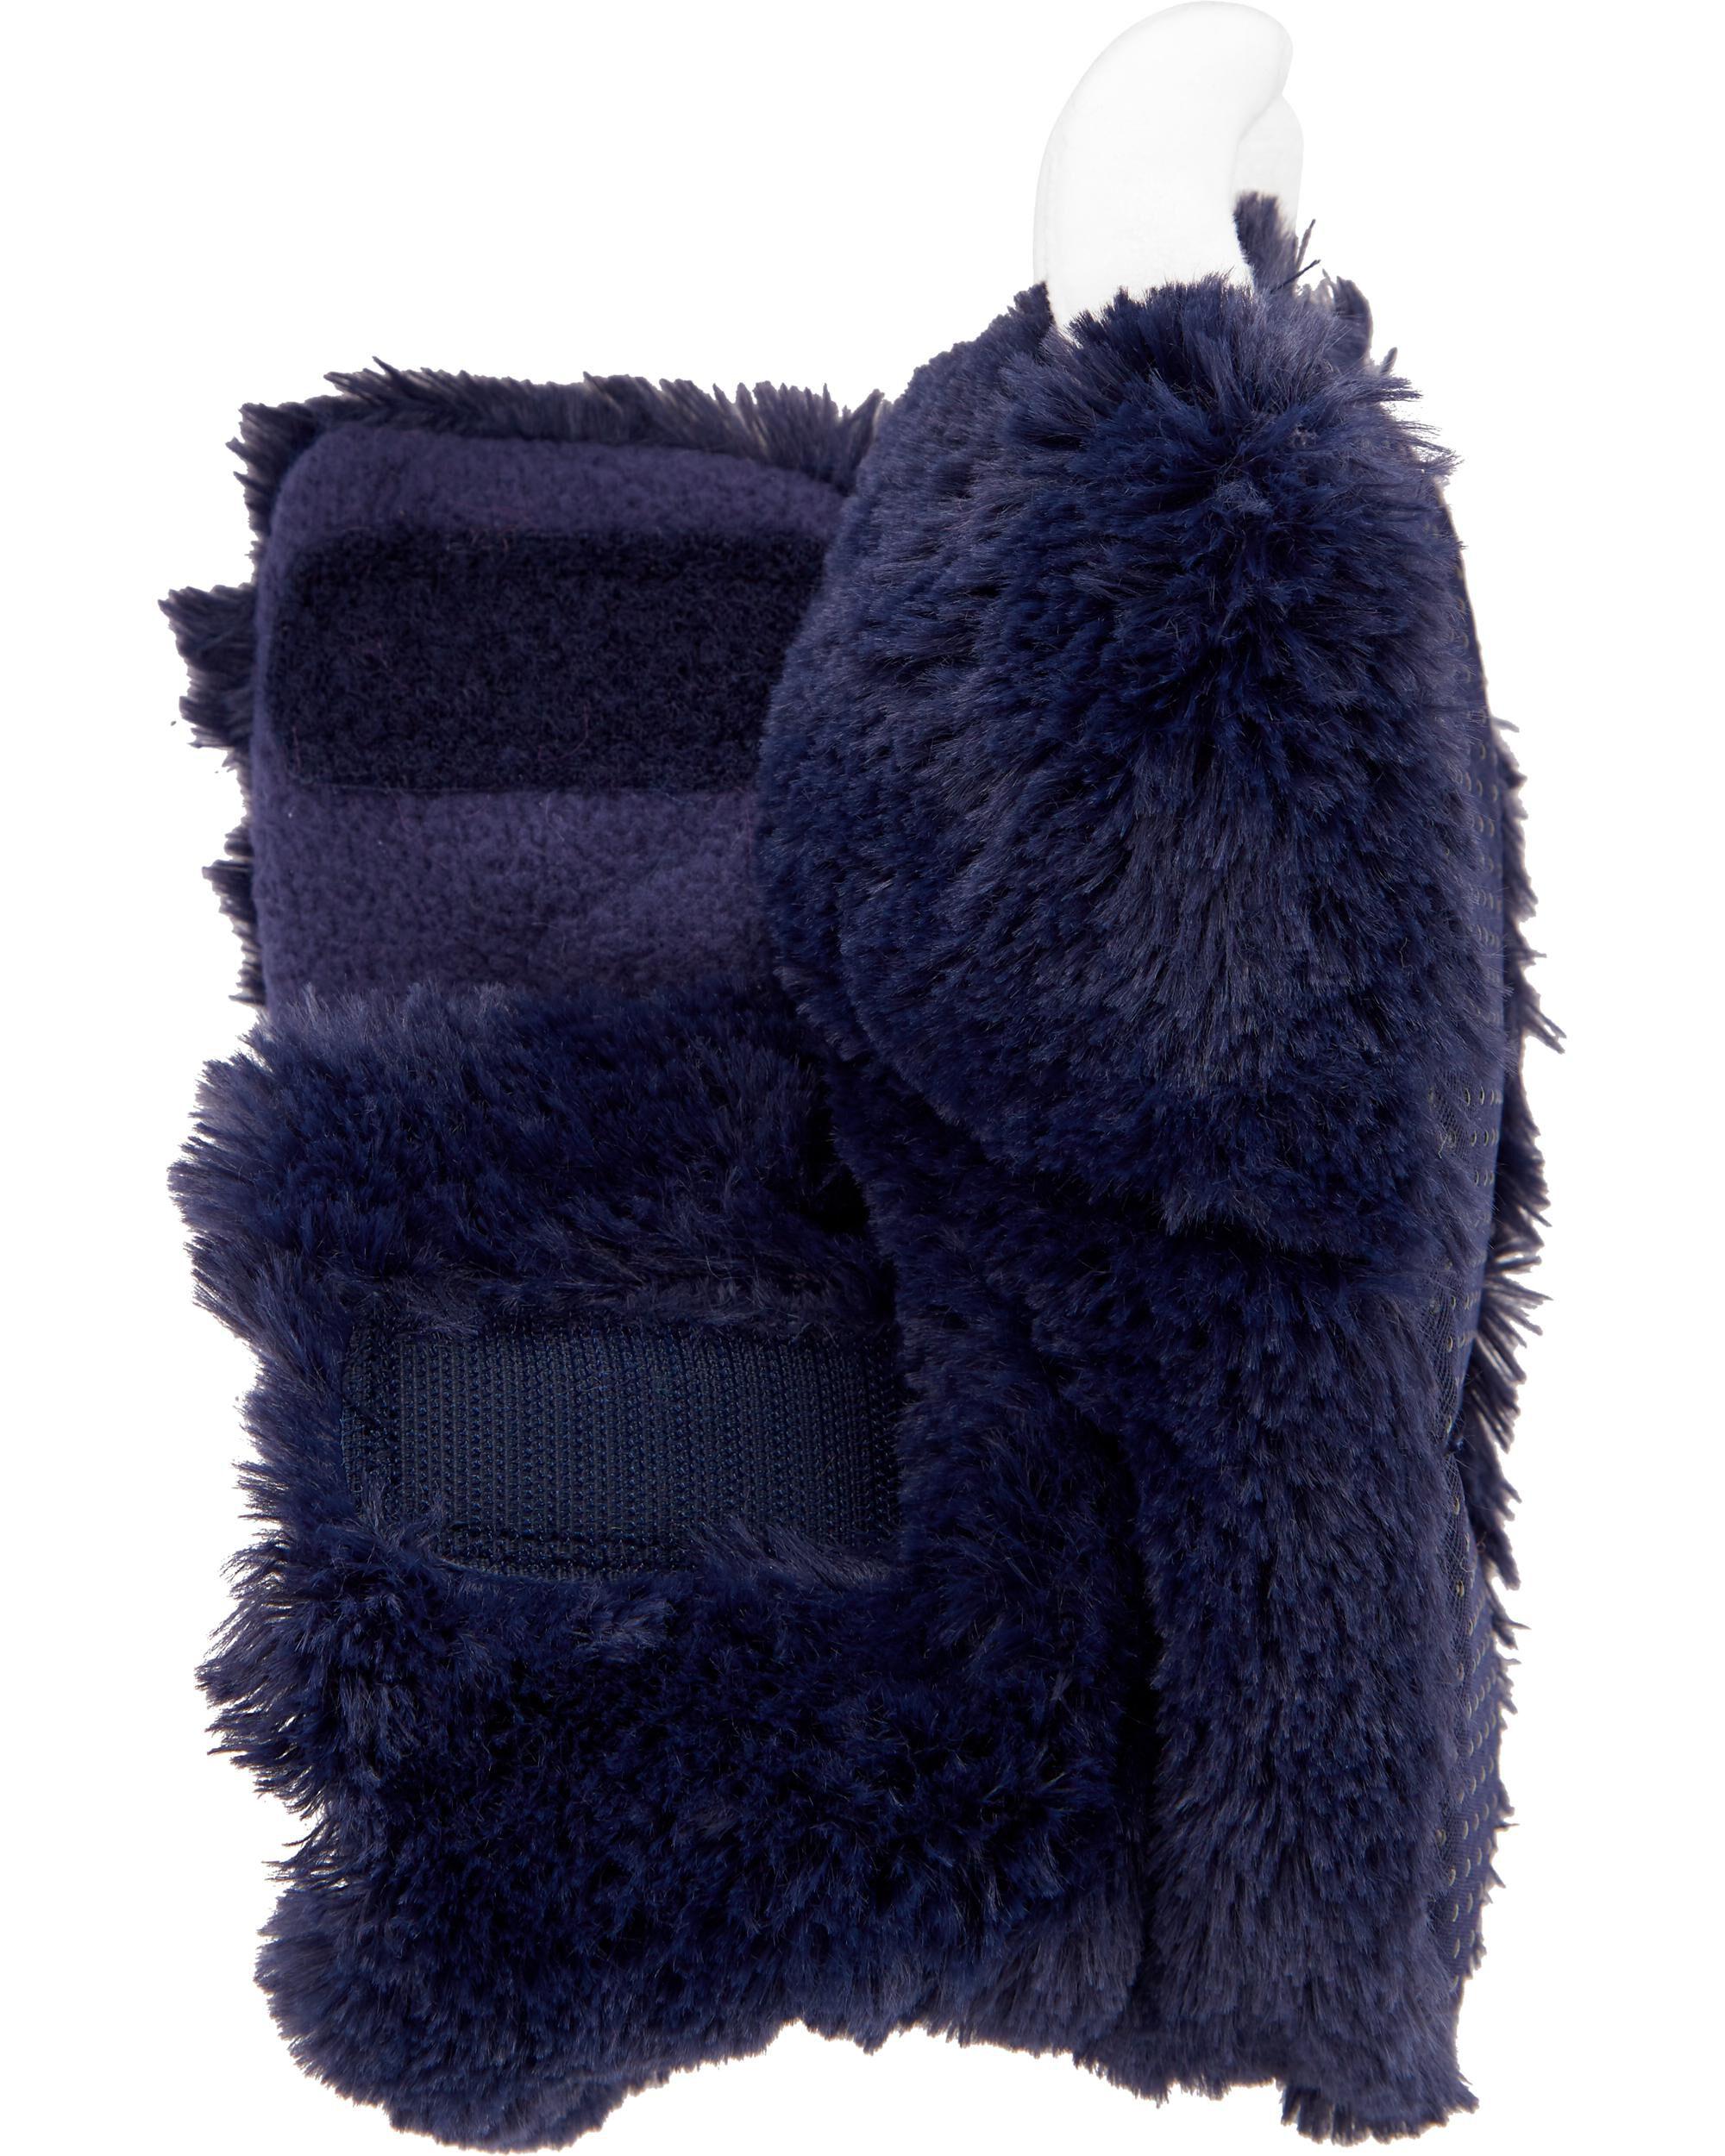 carters dinosaur slippers